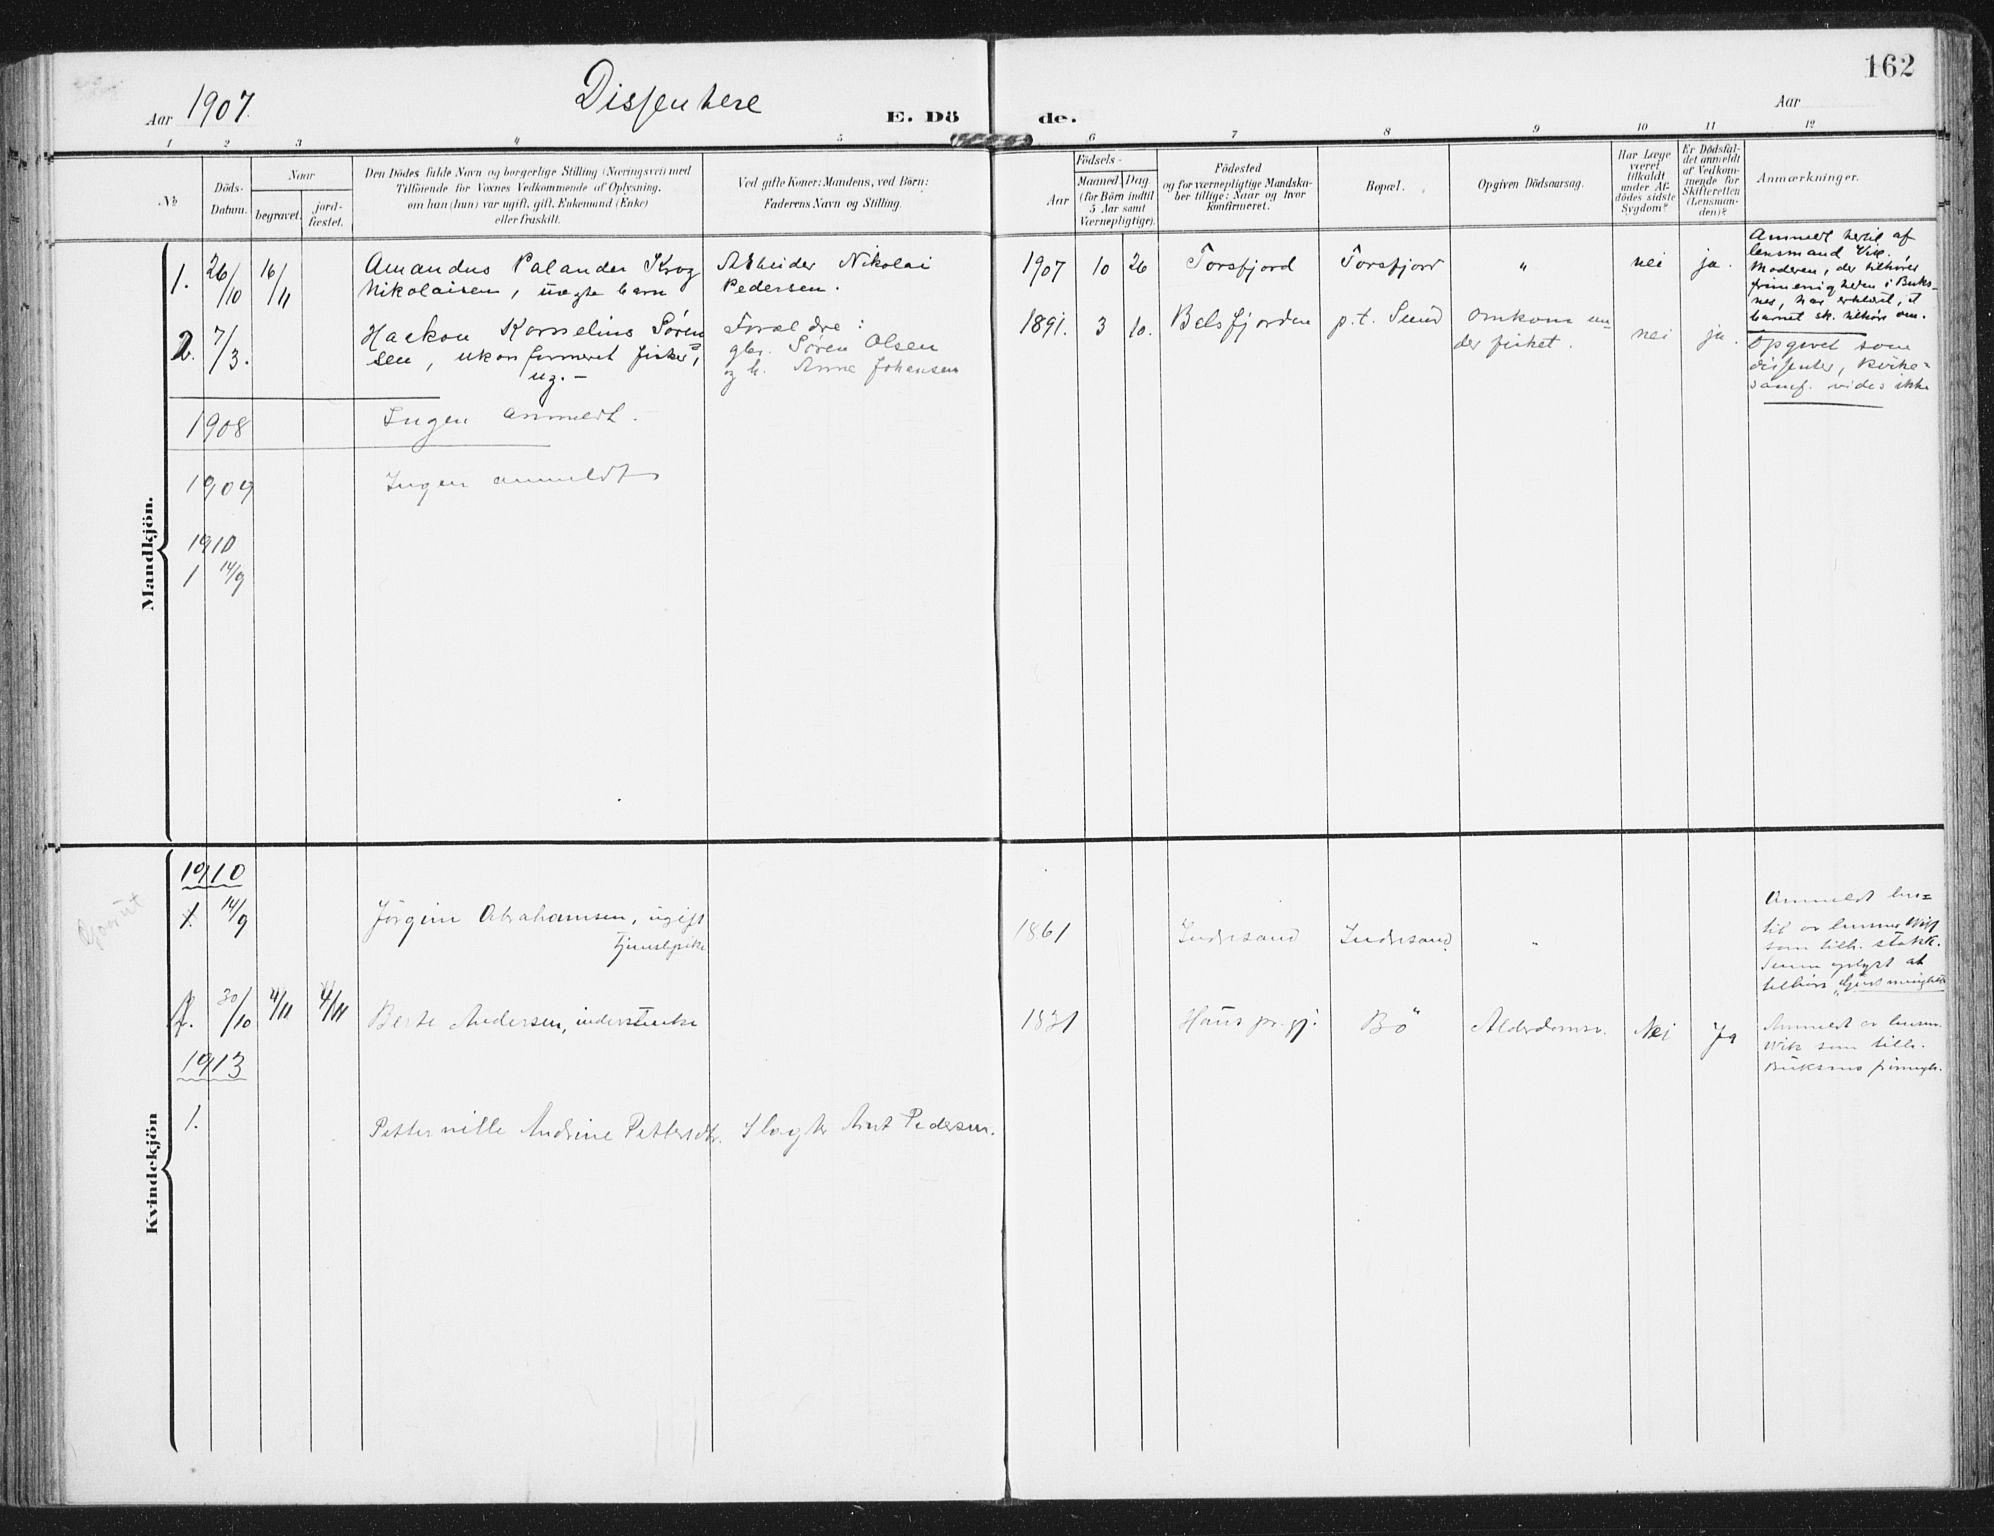 SAT, Ministerialprotokoller, klokkerbøker og fødselsregistre - Nordland, 885/L1206: Ministerialbok nr. 885A07, 1905-1915, s. 162